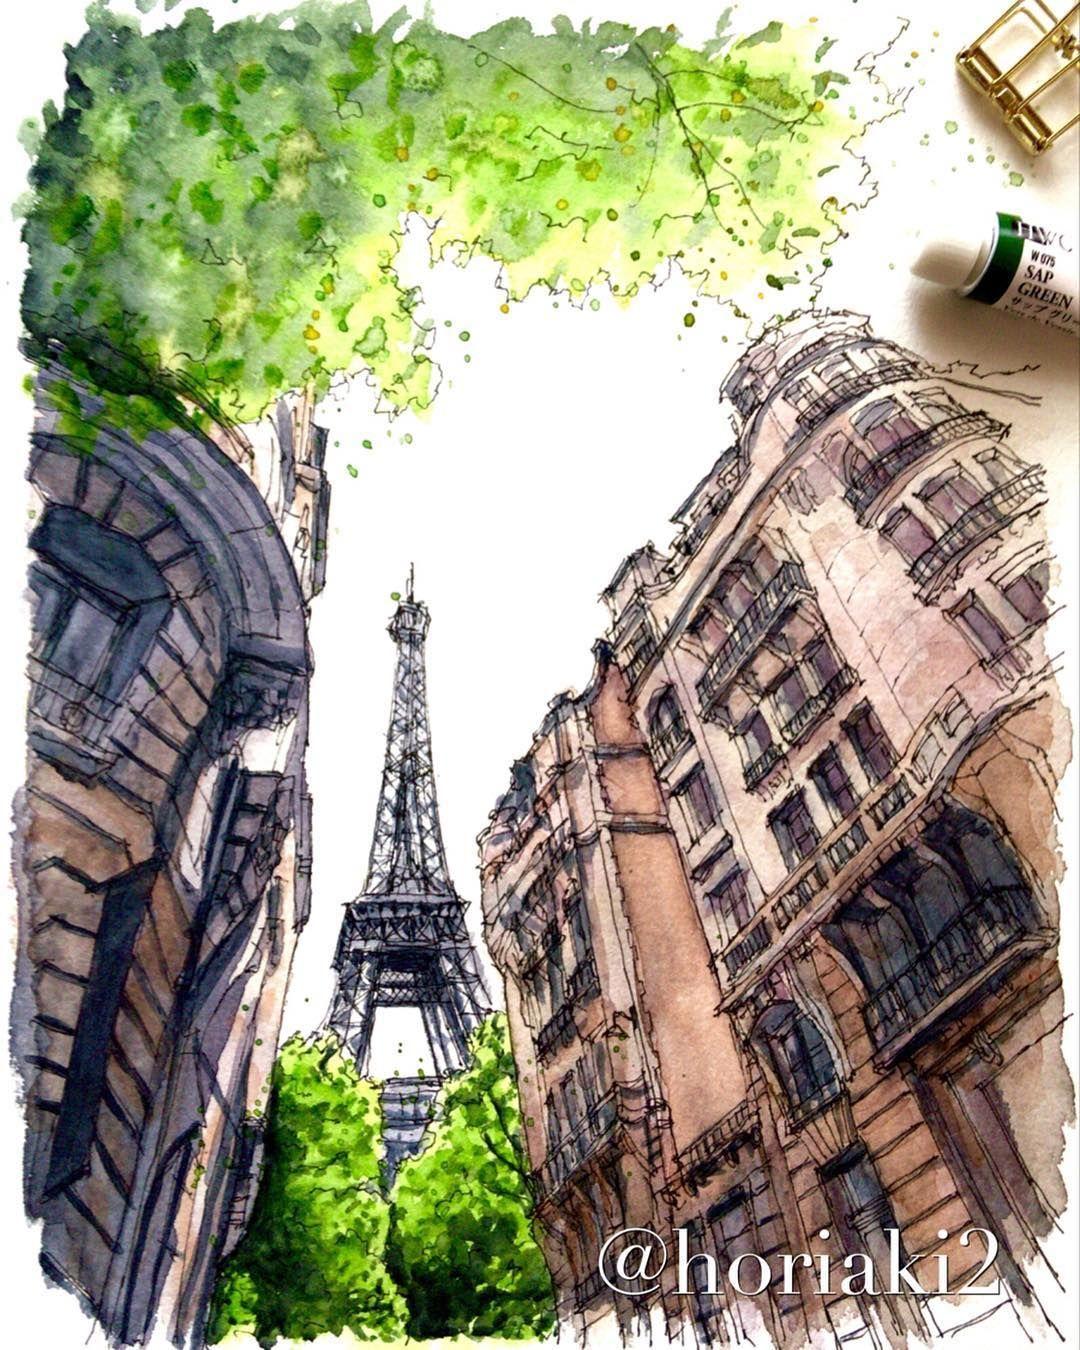 "Akihito Horigome on Instagram: ""パリ・エッフェル塔 — The Eiffel Tower , Paris ???????? #水彩画 #スケッチ #watercolor #watercolour #watercolorsketch #watercolorartist #watercolorpainting…"" #eiffeltower パリ・エッフェル塔 — The Eiffel Tower , Paris ???????? #水彩画 #スケッチ #watercolor #watercolour #watercolorsketch #watercolorartist #watercolorpainting…"